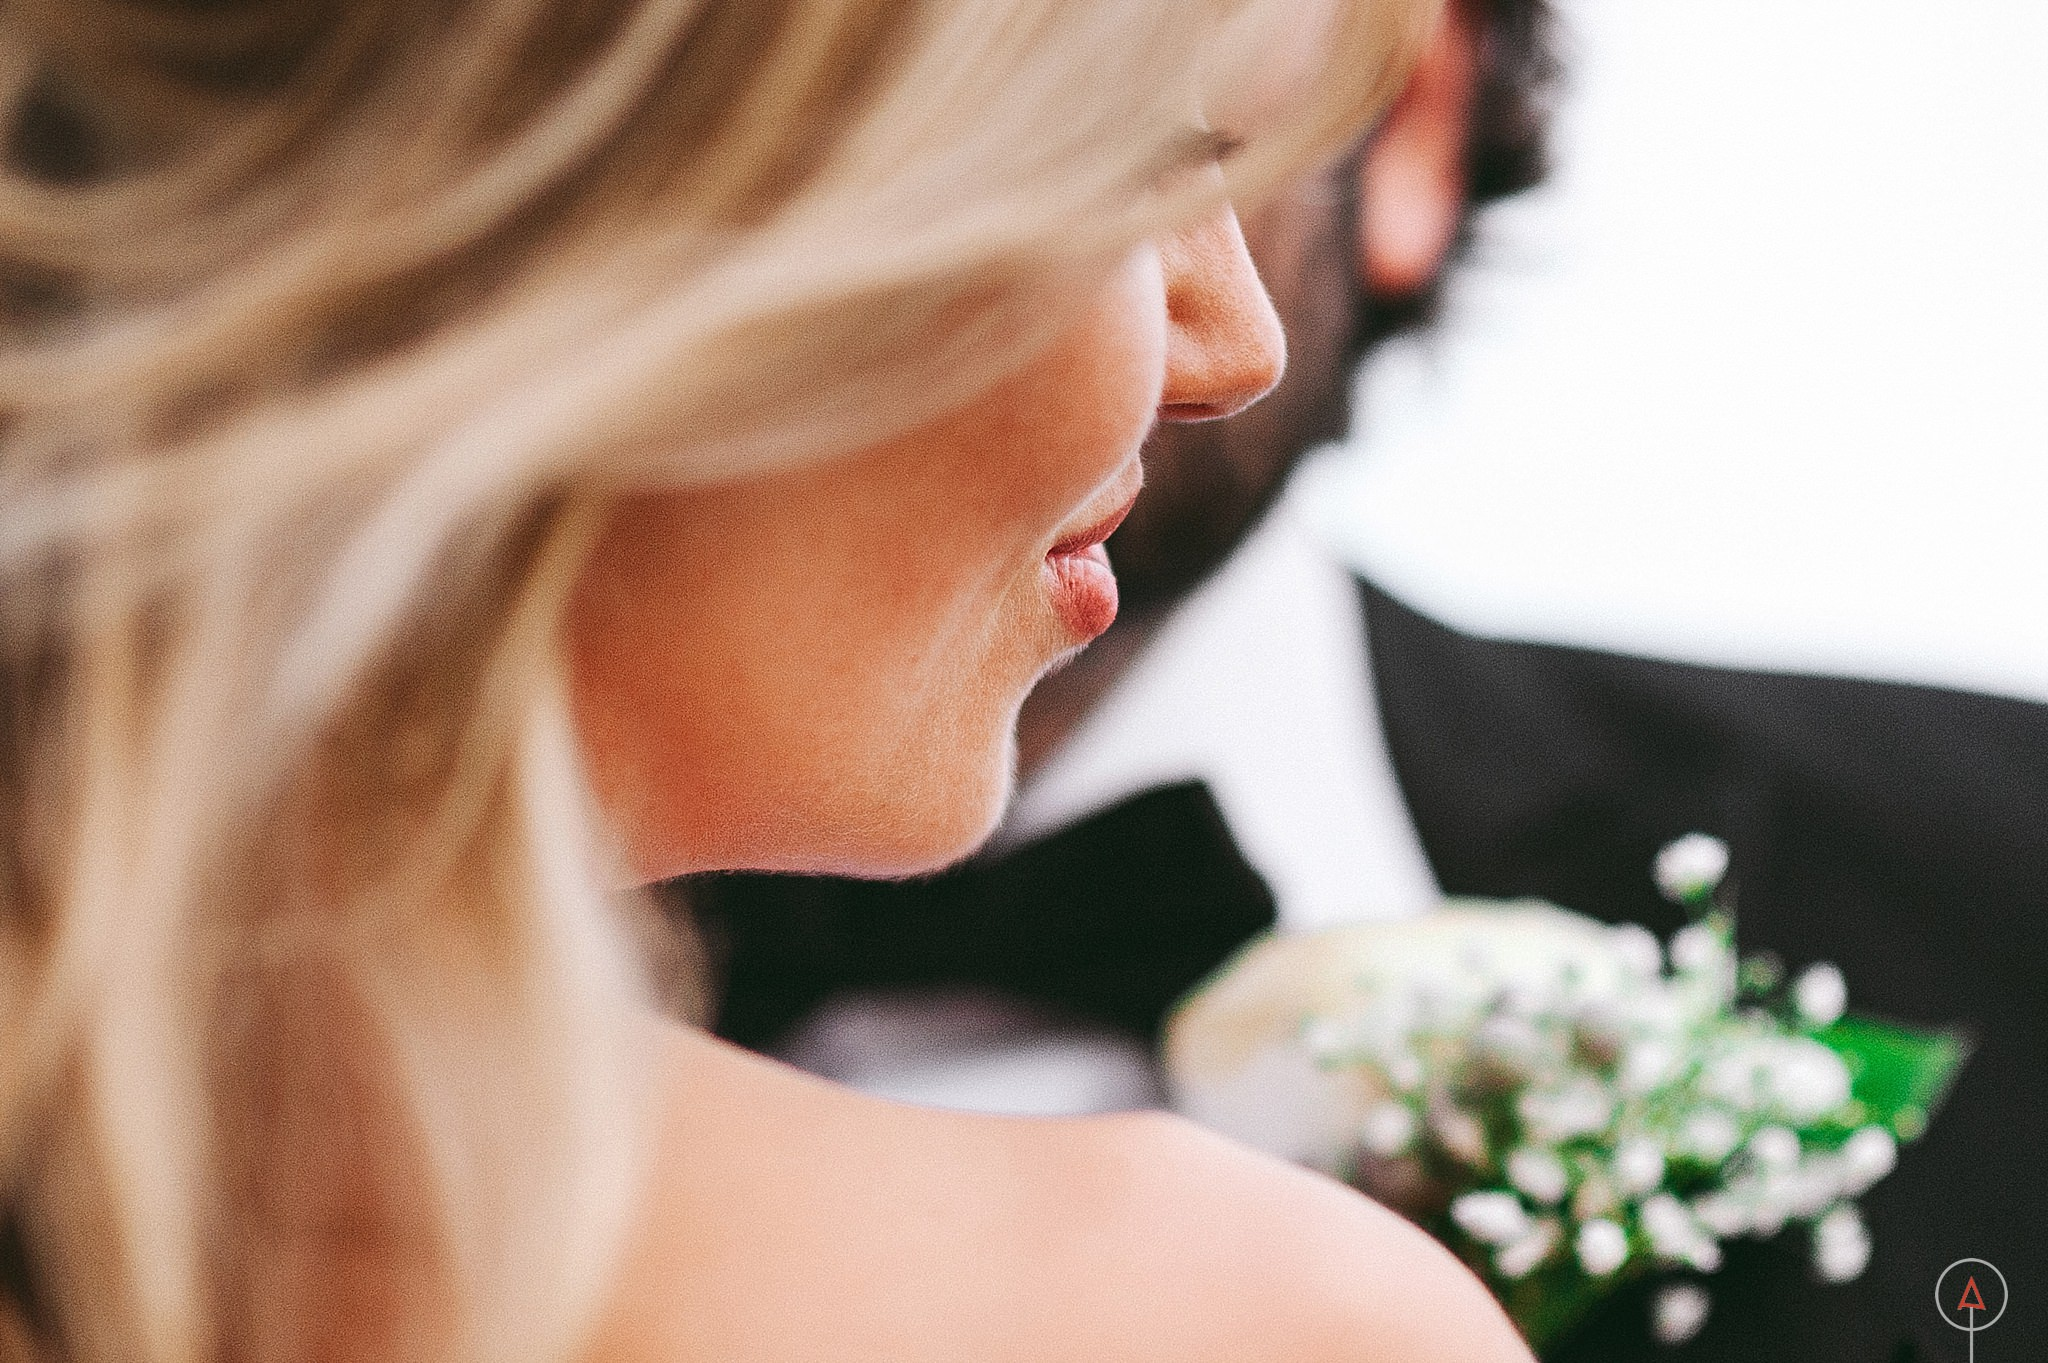 cardiff-wedding-photographer-aga-tomaszek_0403